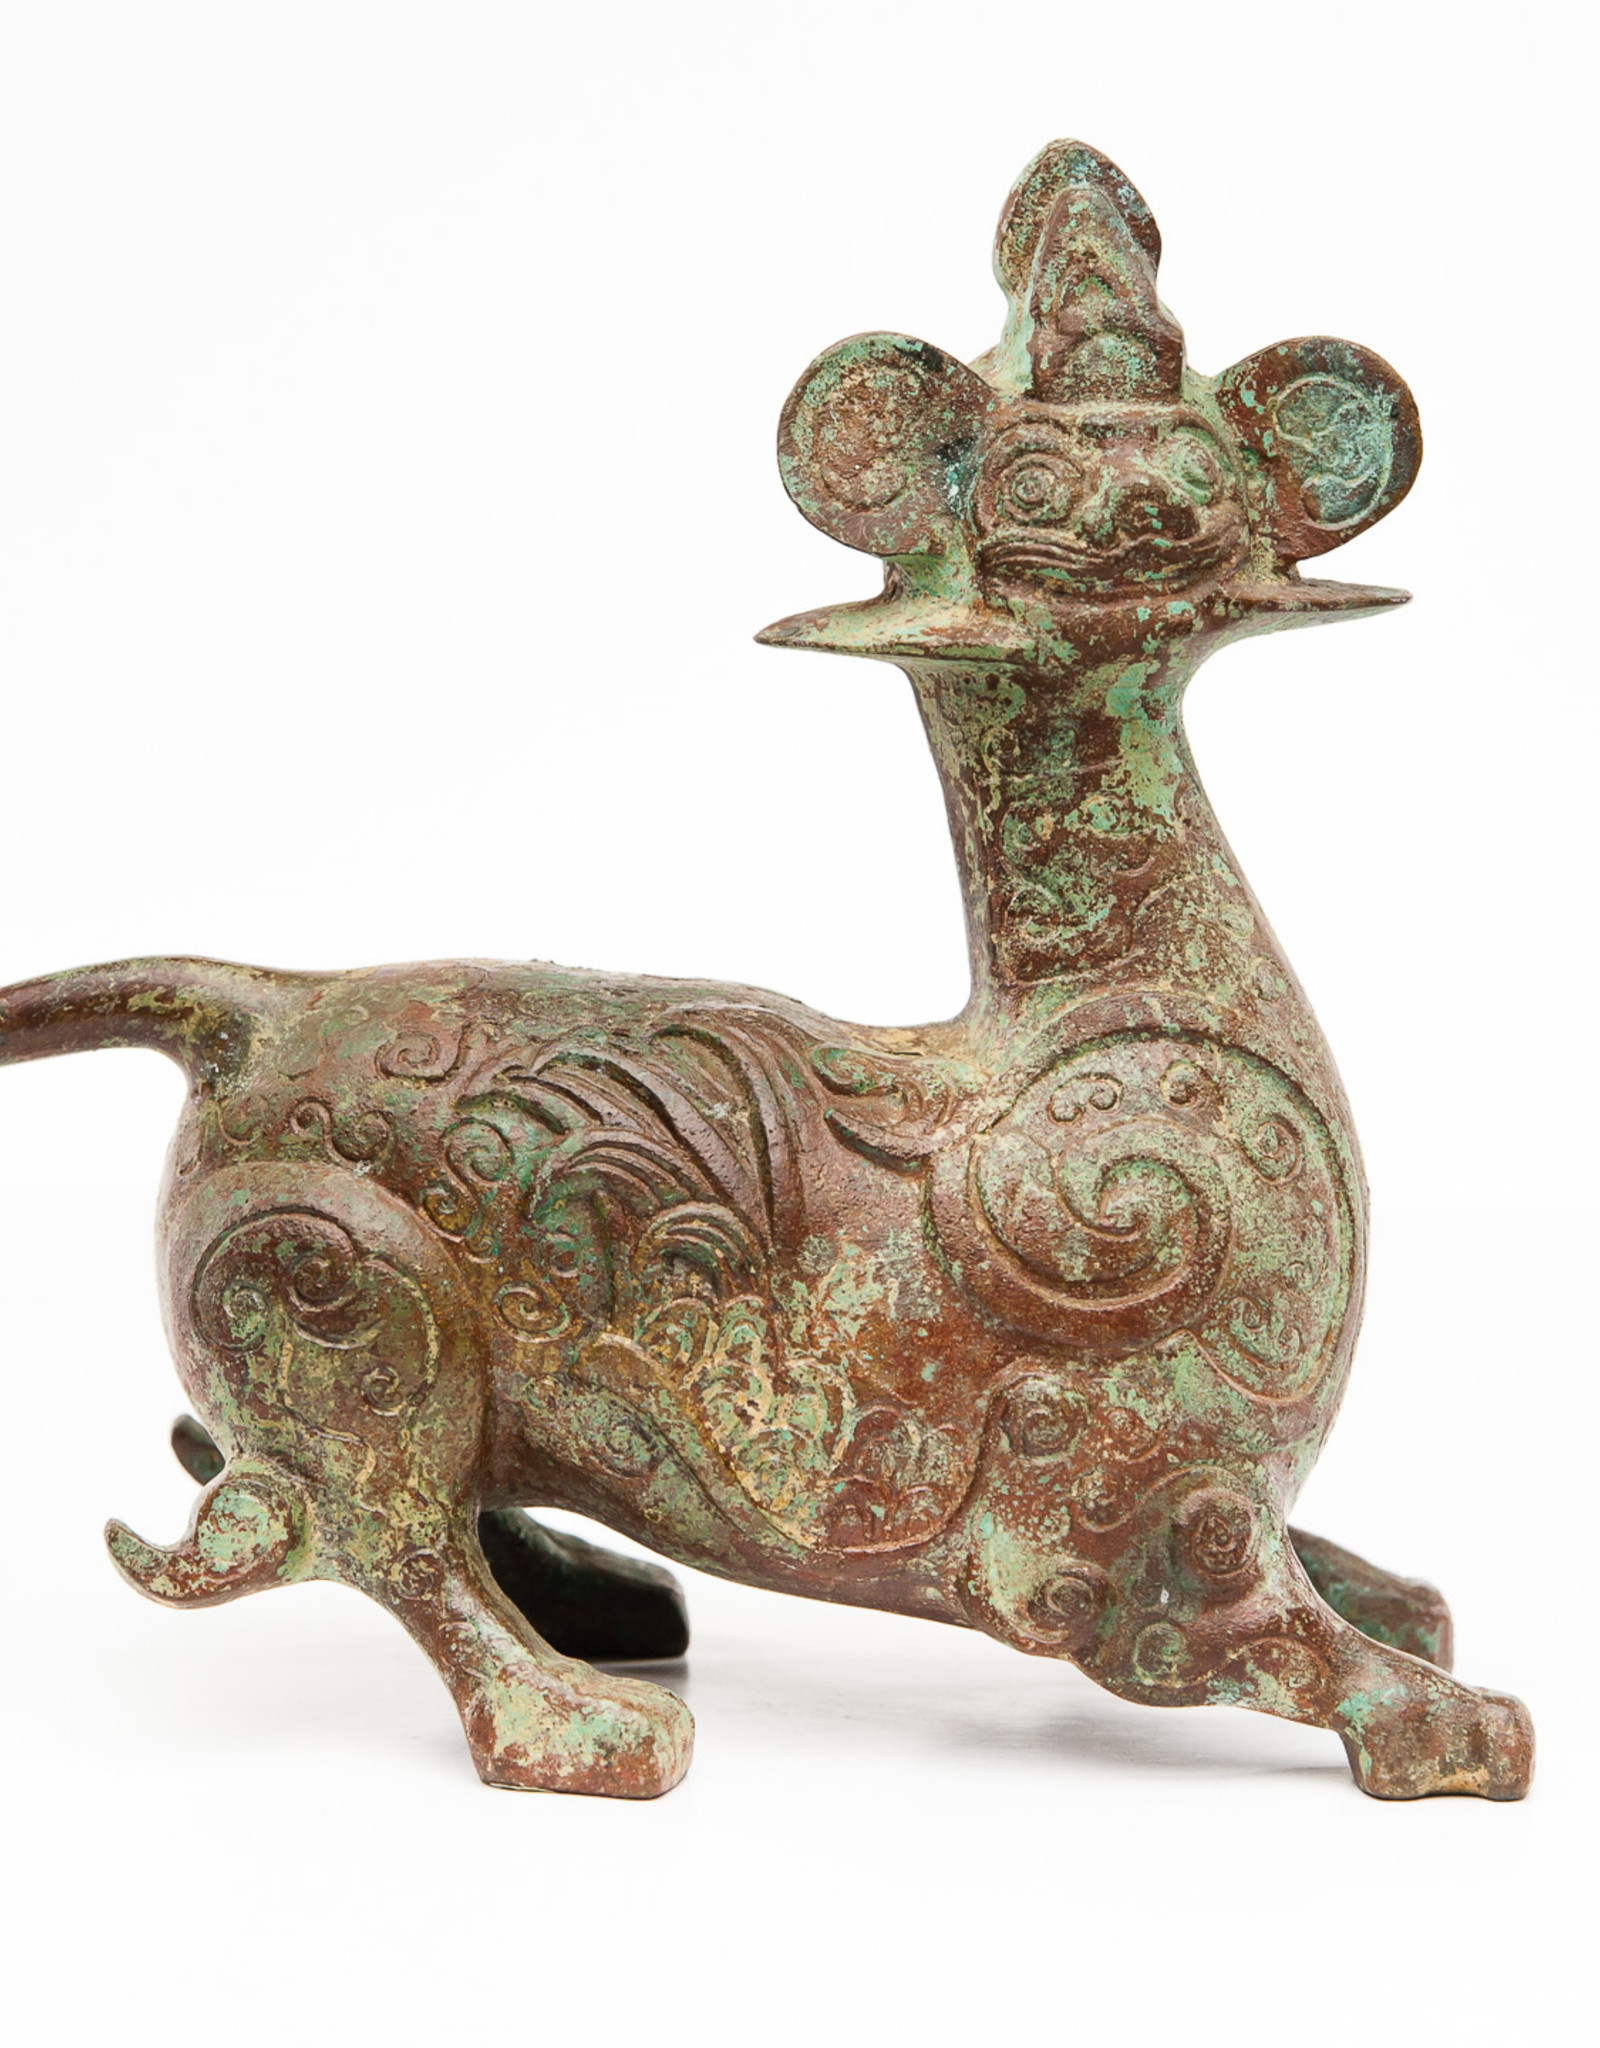 Lawrence & Scott Patinated verdigris bronze Monkey Dragon